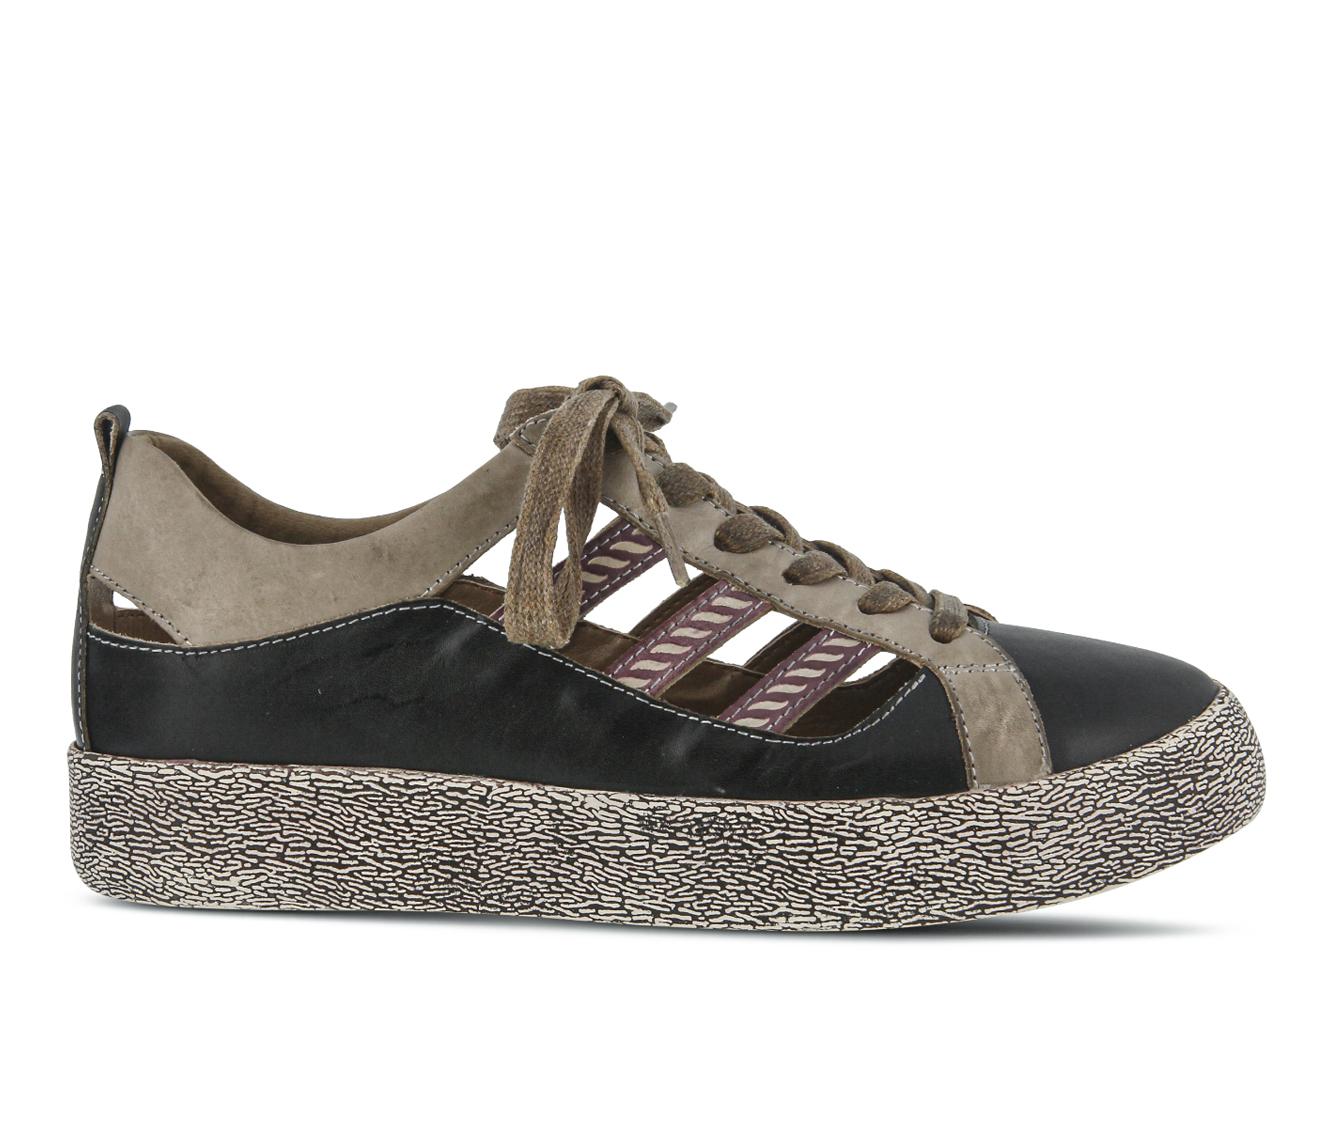 L'Artiste Porscha Women's Shoe (Black Leather)